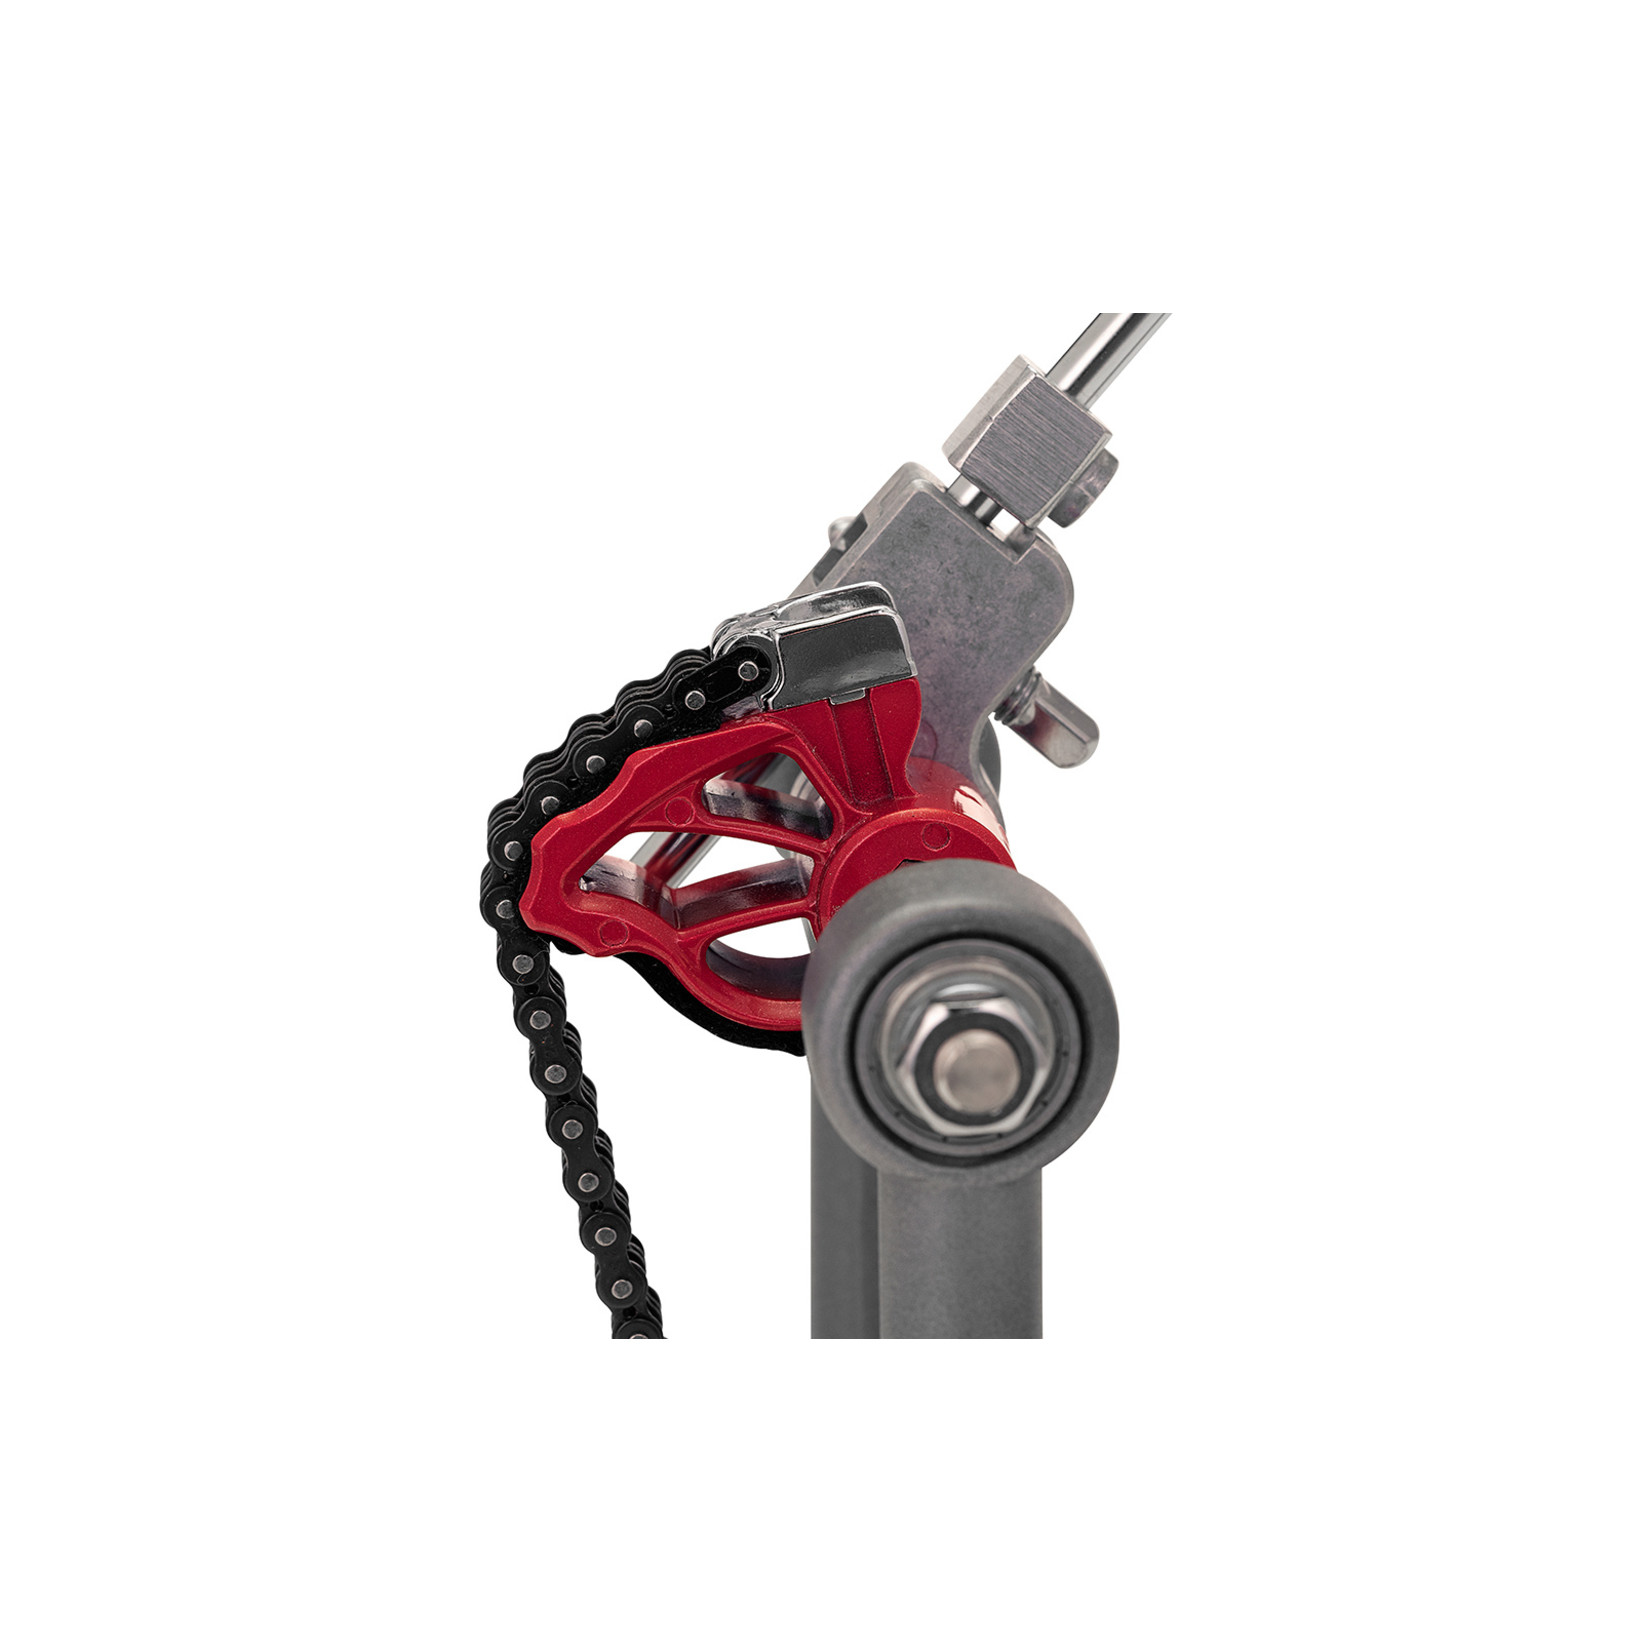 Pearl PEARL ELIMINATOR SOLO SINGLE PEDAL (RED CAM) P1030R